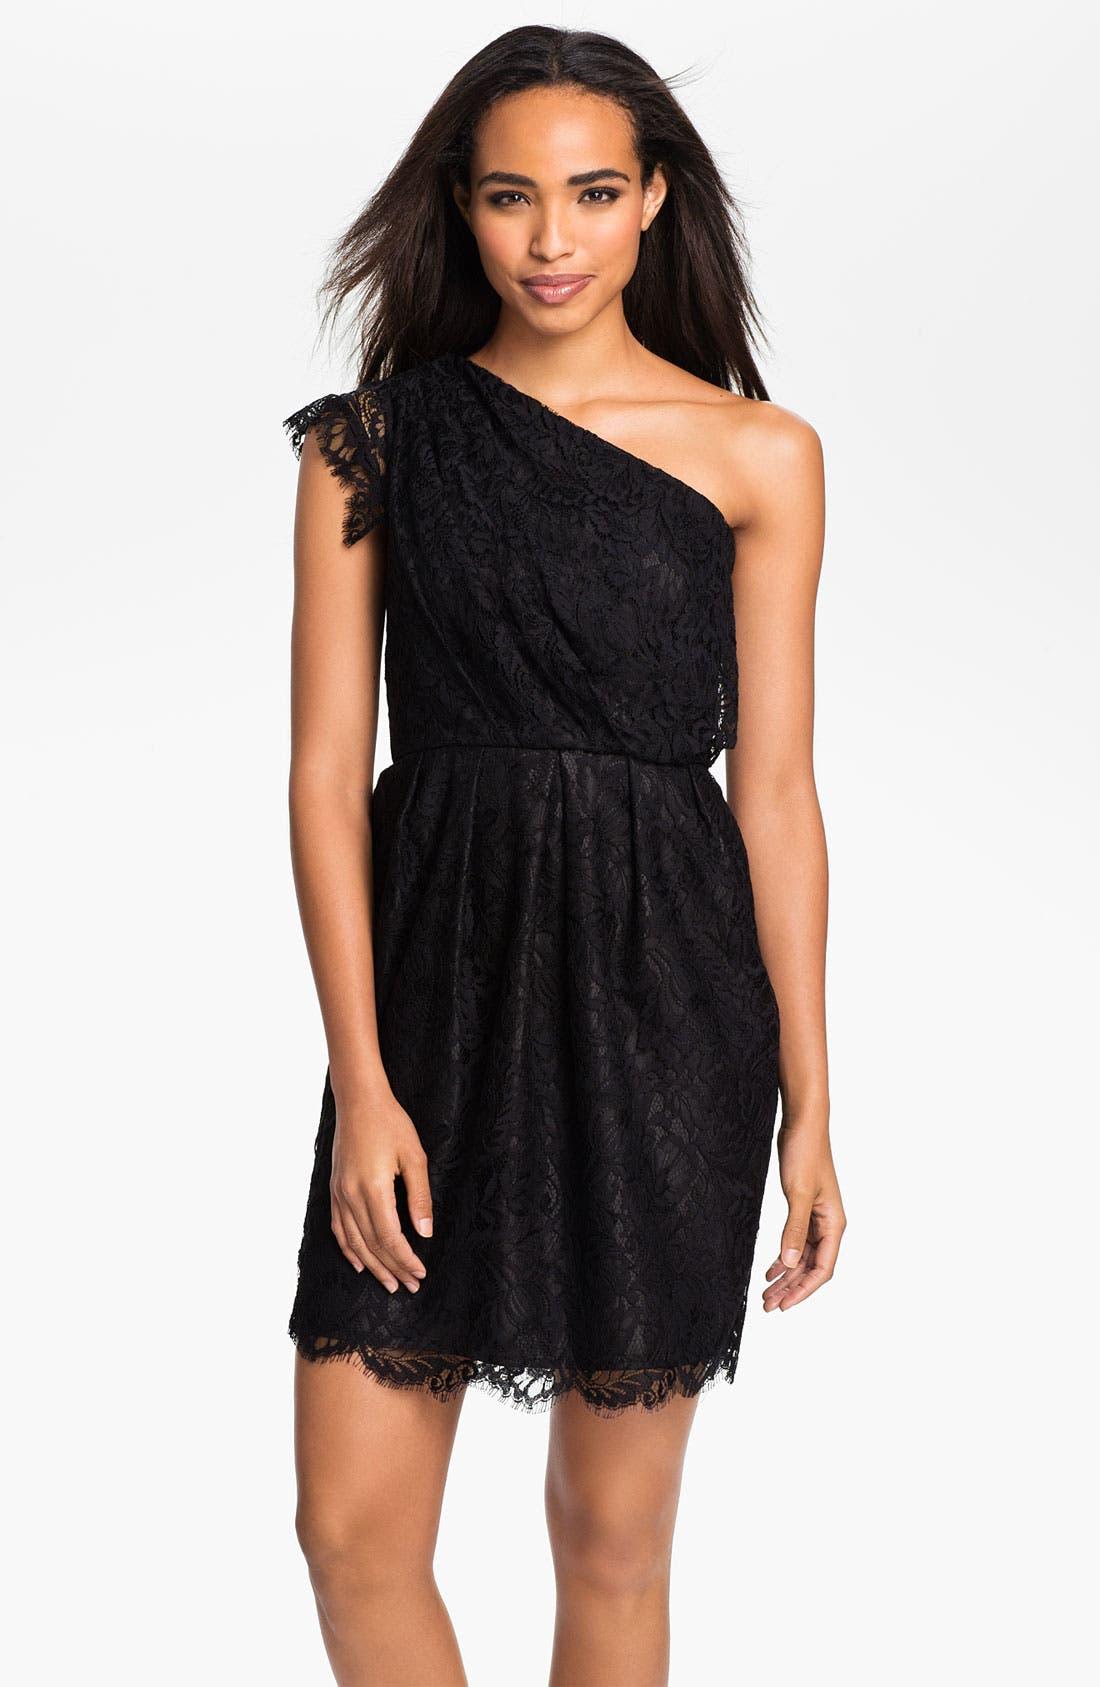 Main Image - Shoshanna 'Verona' One Shoulder Lace Dress